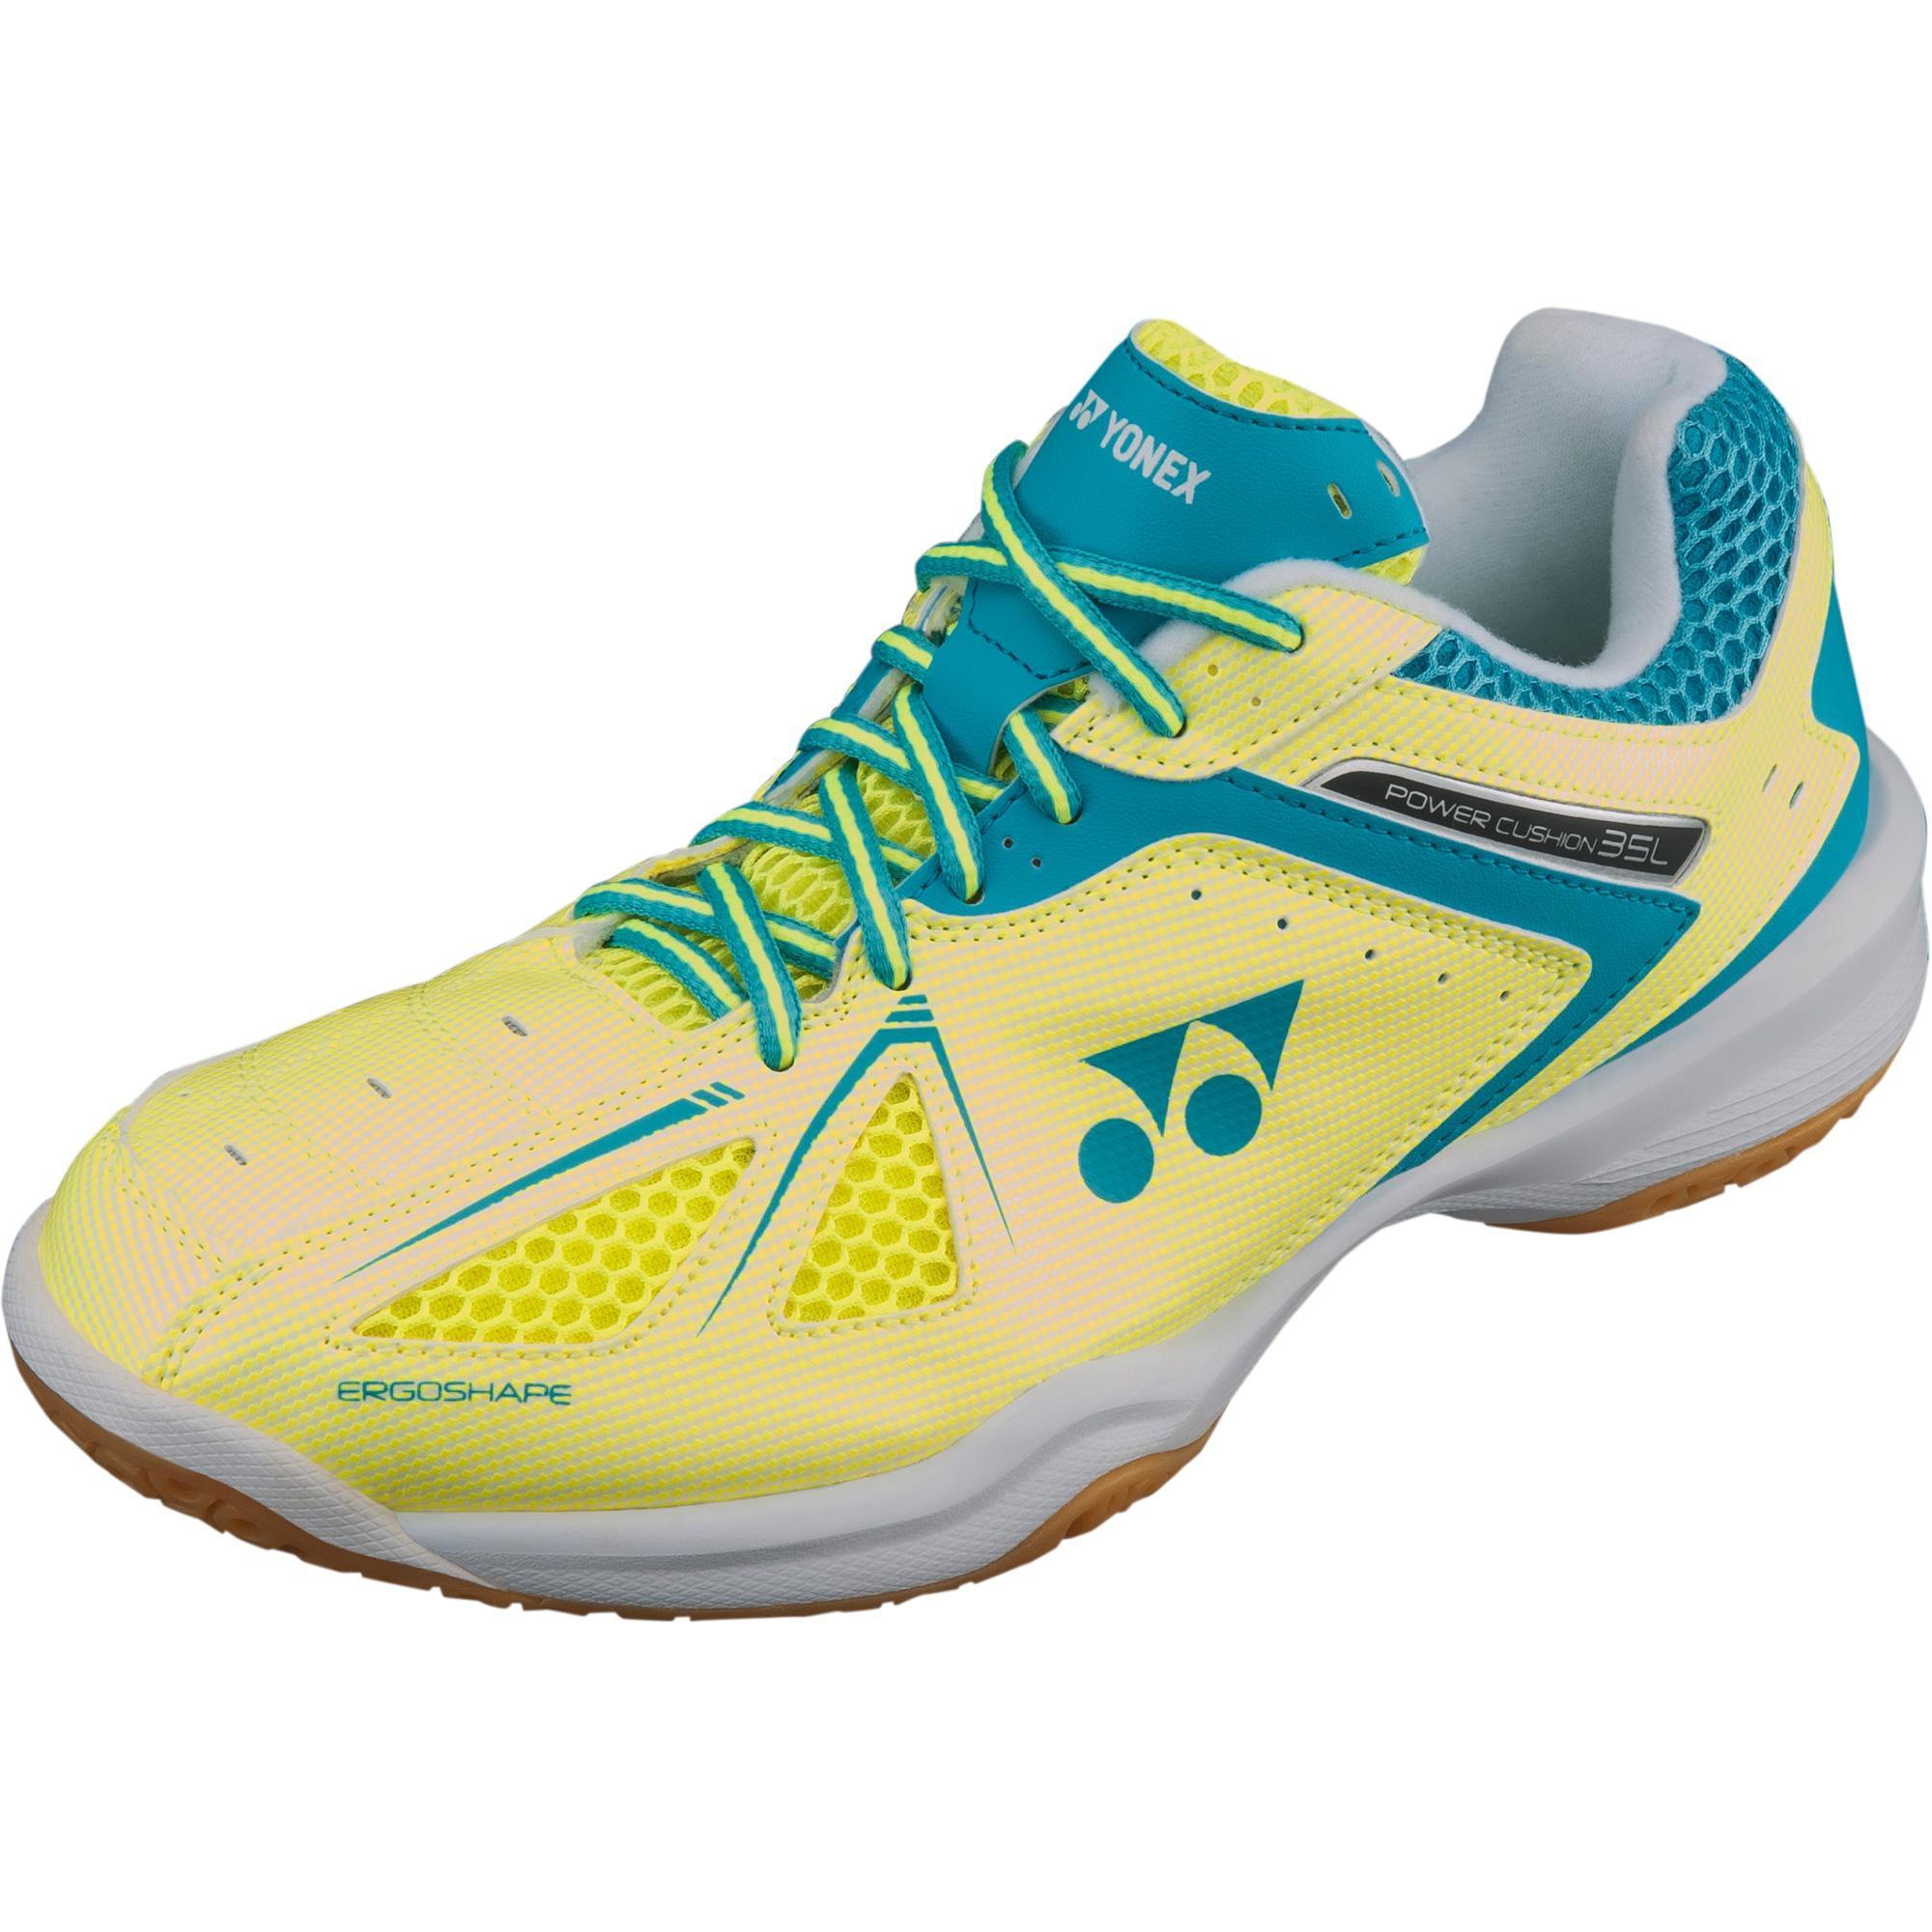 a4ccb7bc2f23d Yonex Womens Power Cushion SHB 35 Badminton Shoes - Yellow